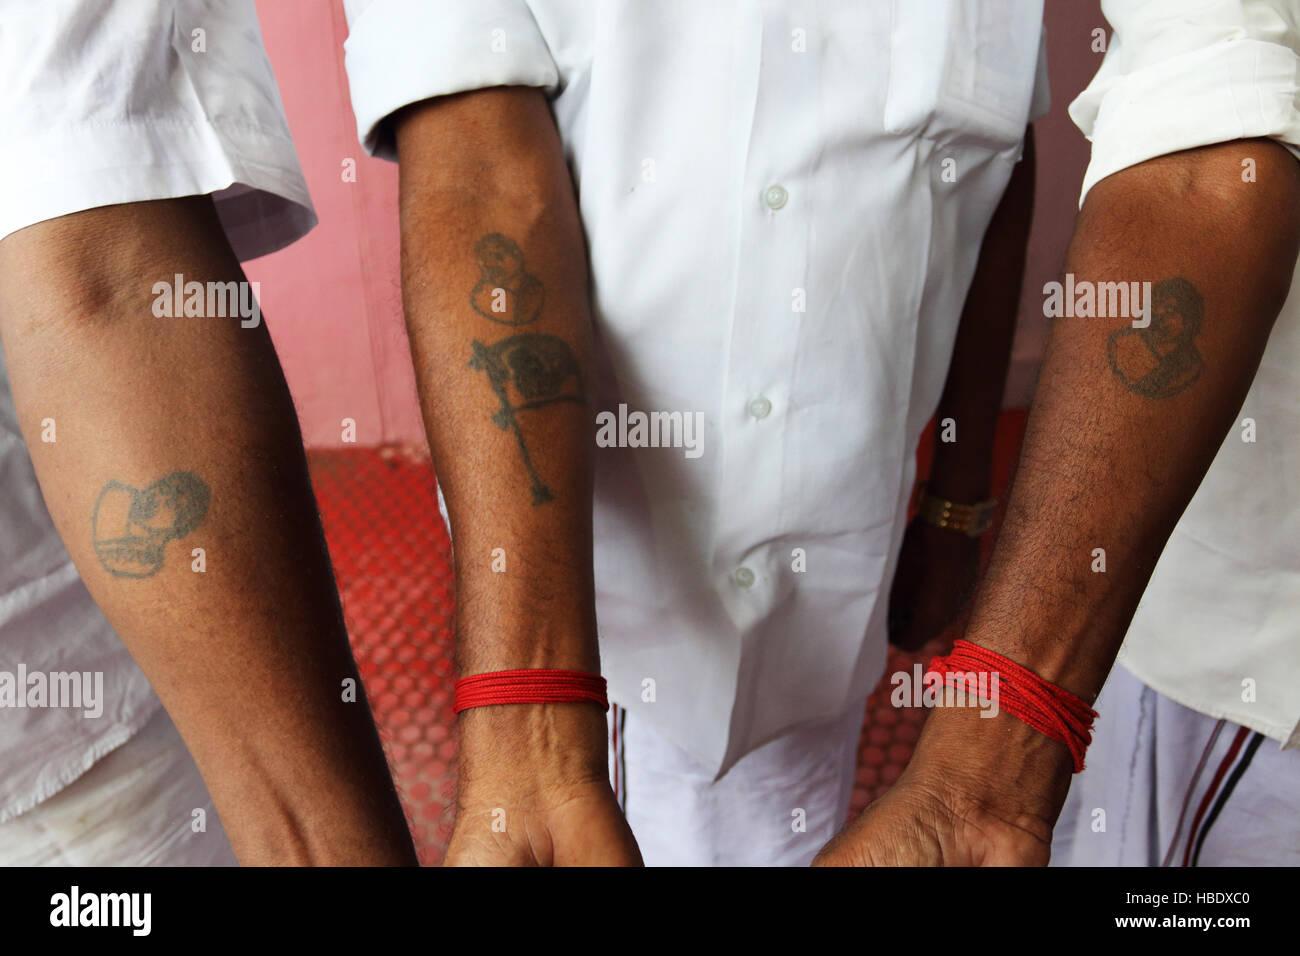 Devotees of Jayalalitha Jayaraman, former actress, state minister of Tamil Nadu, show off their Jayalalitha  tattoos. - Stock Image